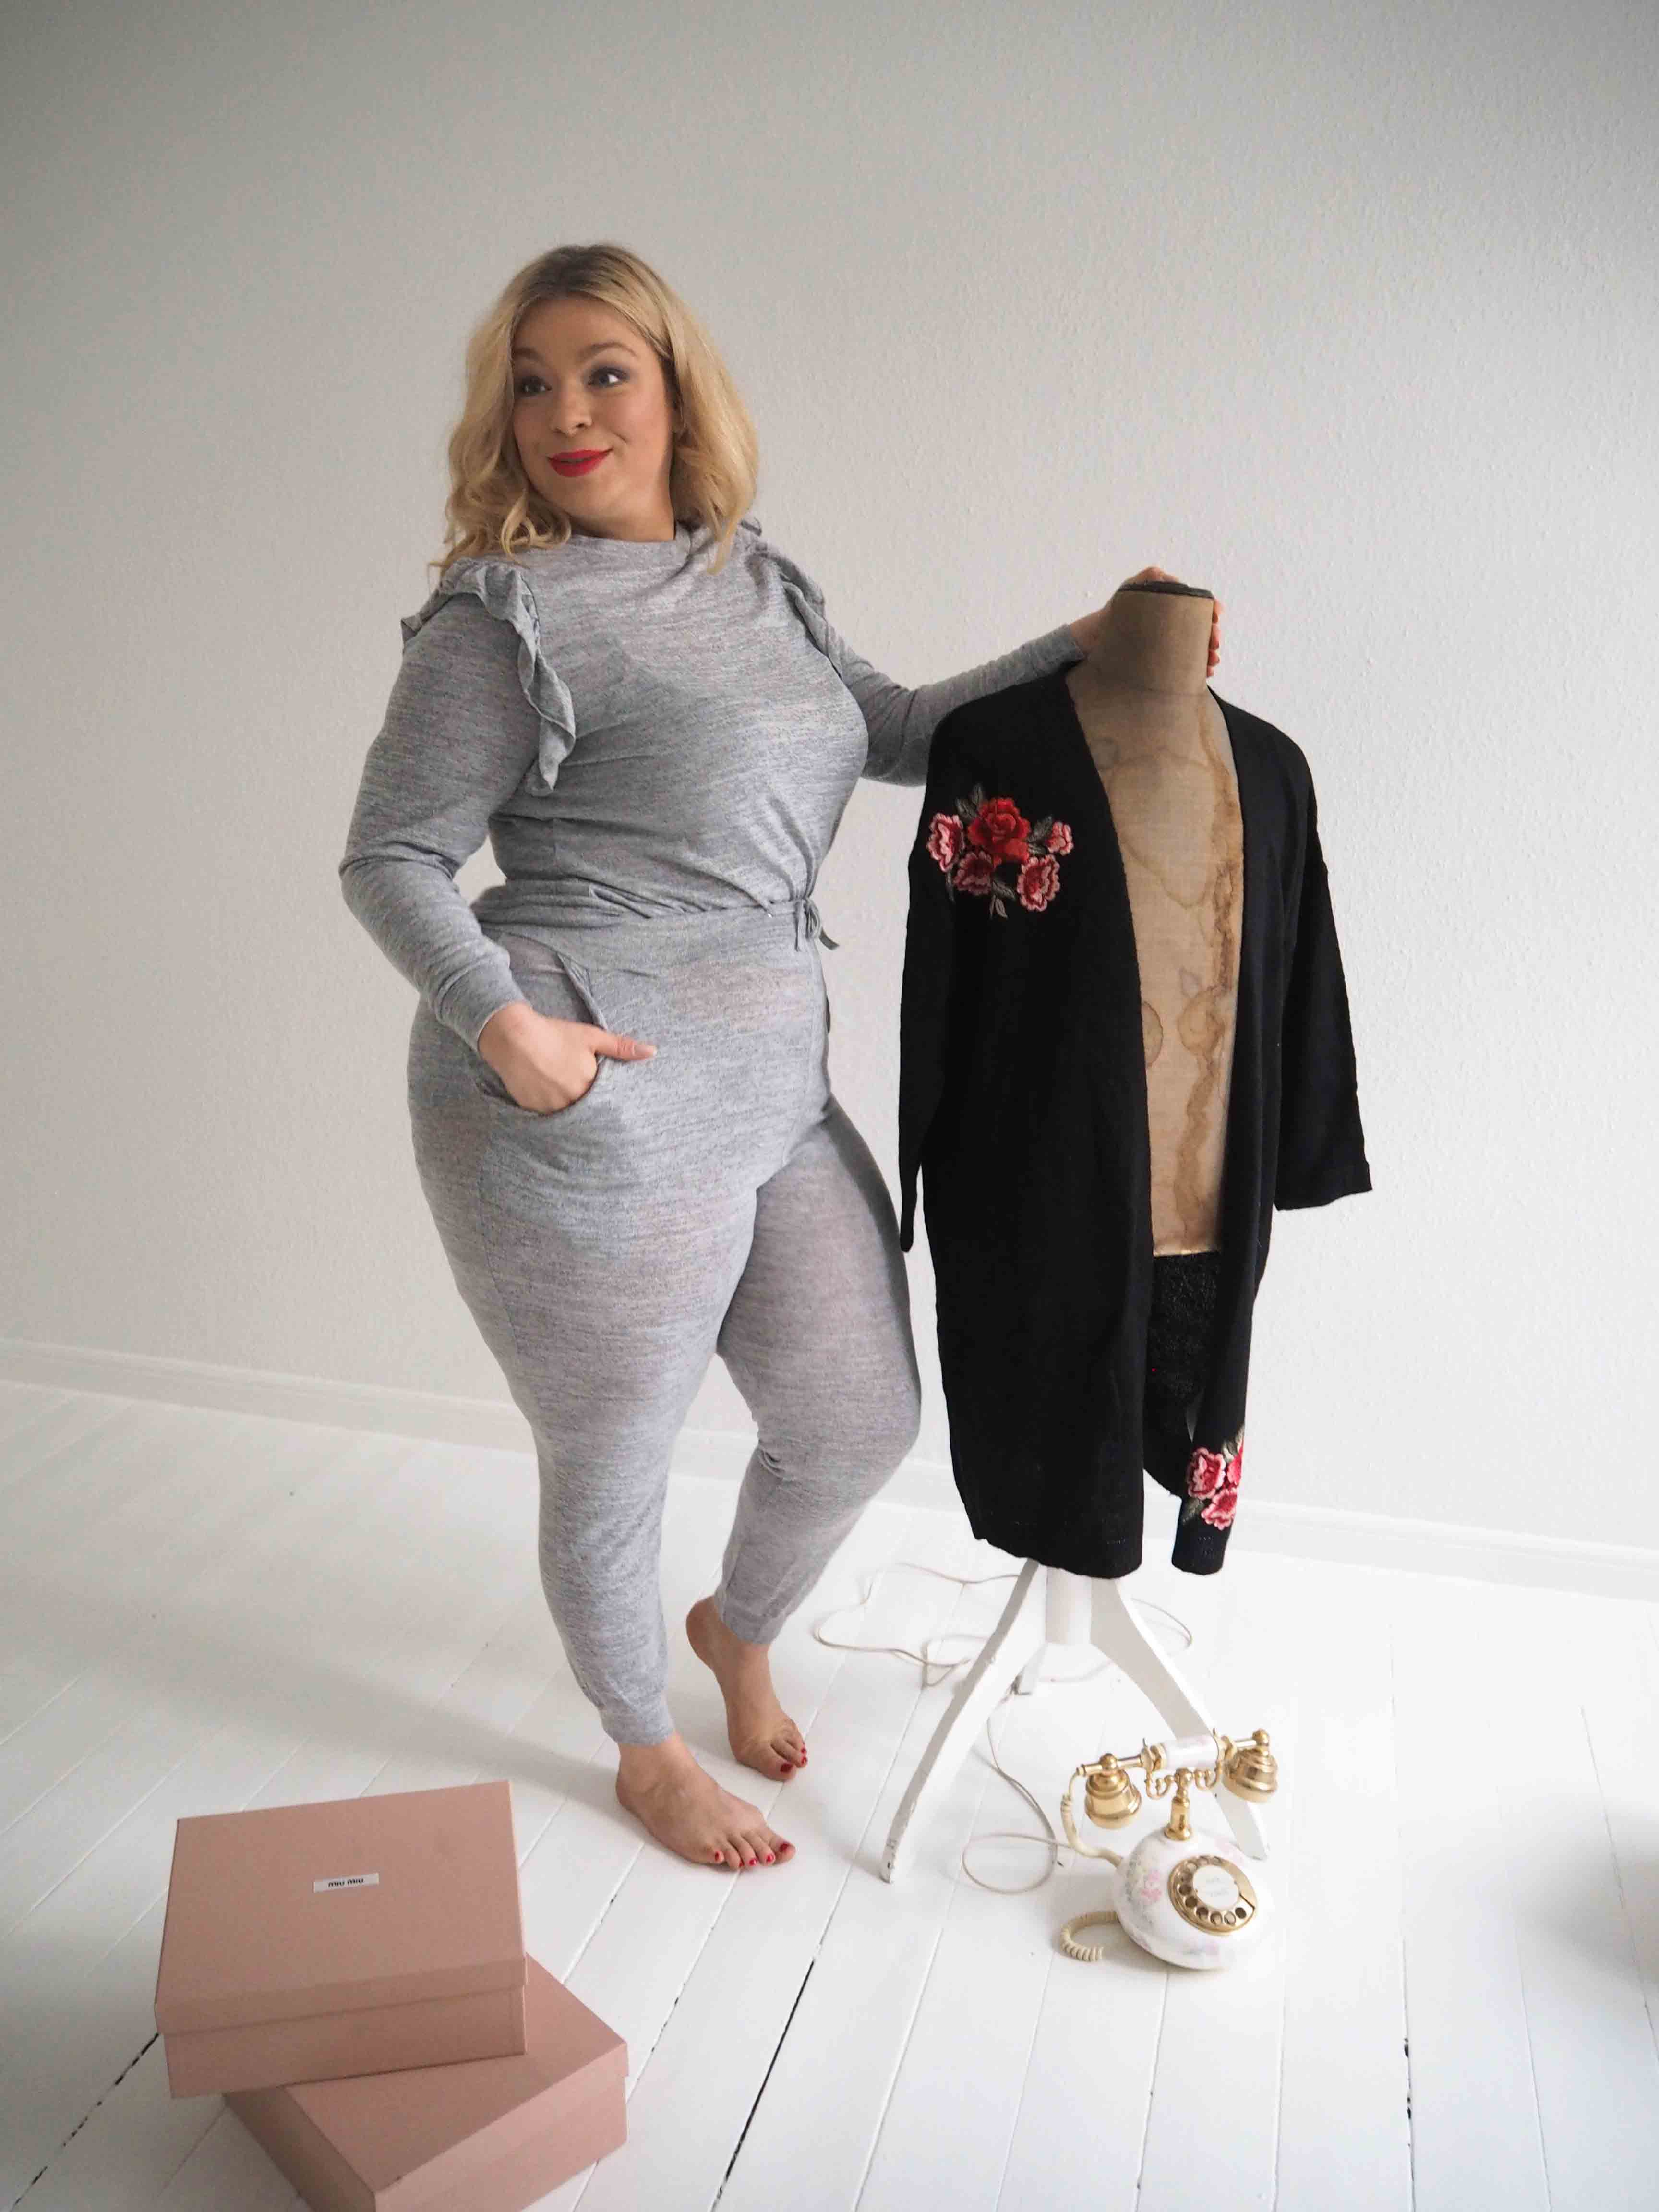 Megabambi-Homewear-plussize-Caterina-pogorzelski